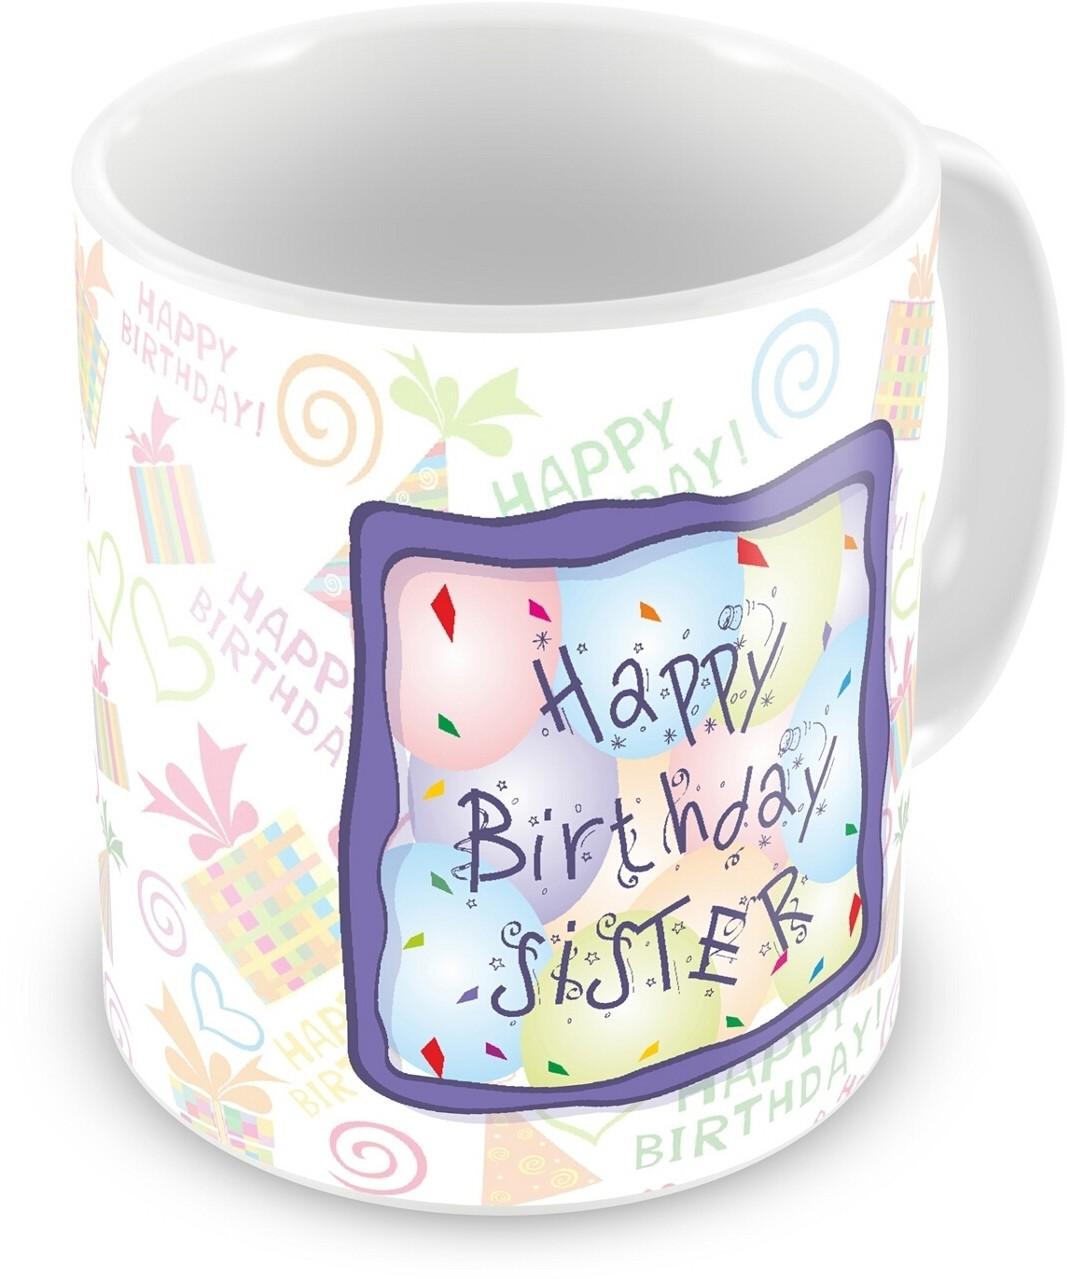 Everyday Gifts Happy Birthday Gift For Sister Ceramic Mug